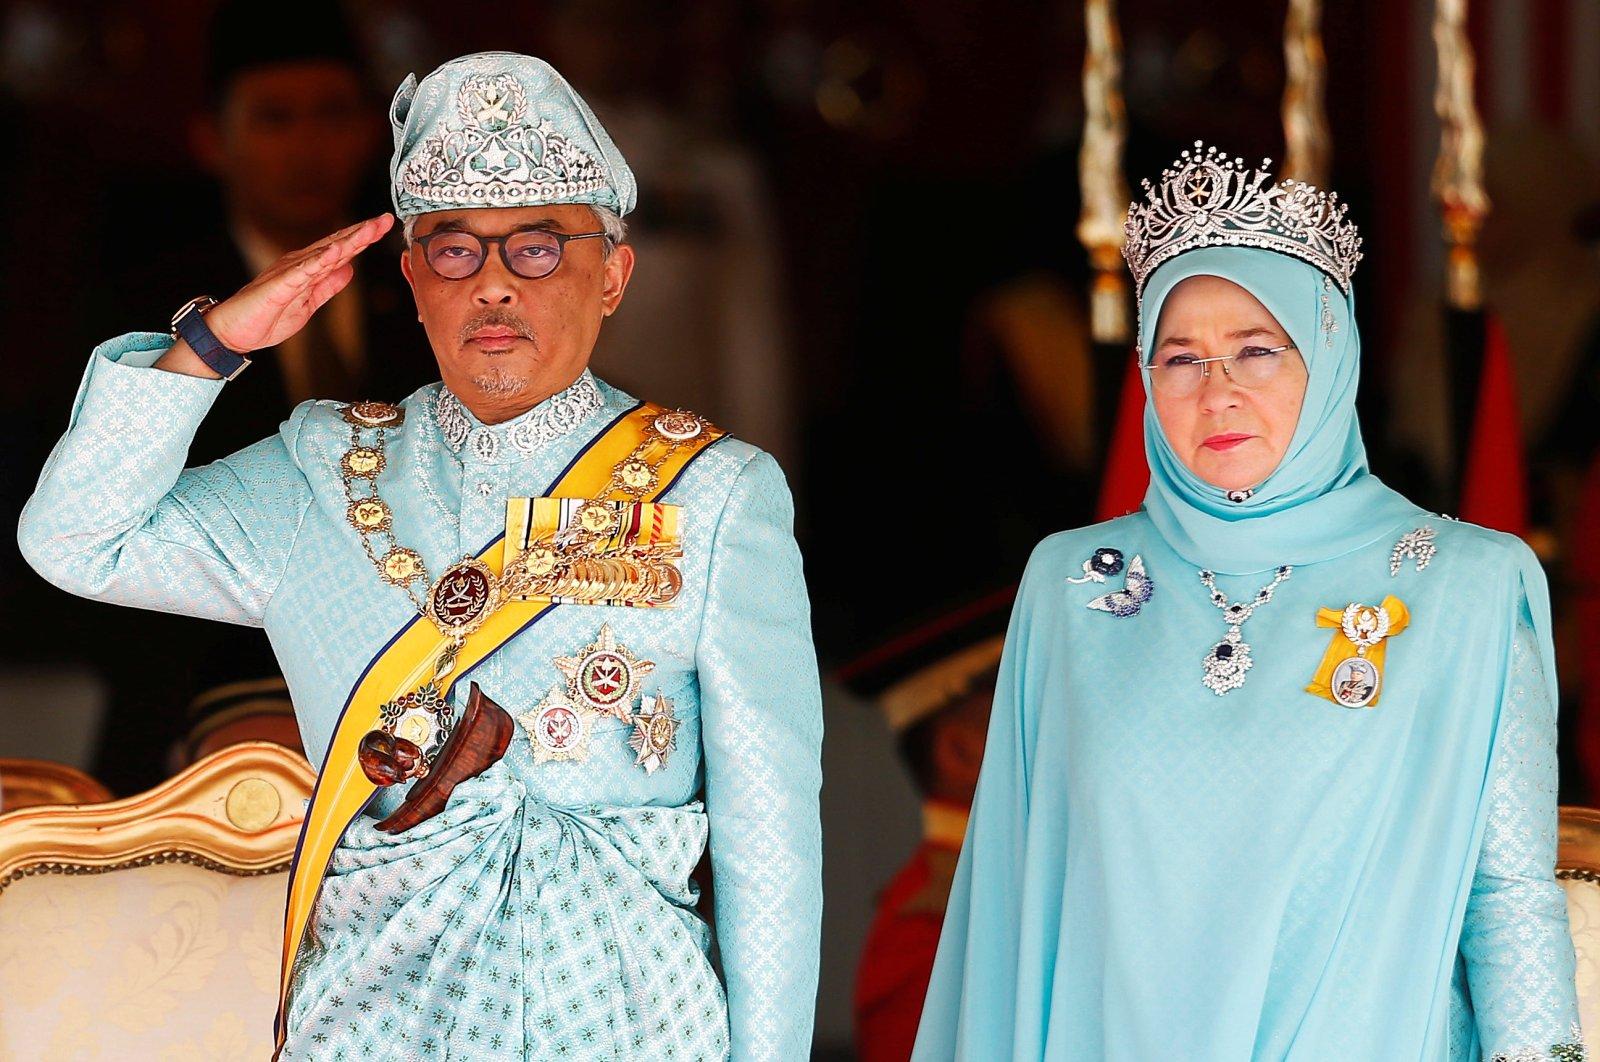 Malaysia's new King Sultan Abdullah Sultan Ahmad Shah (L) and Queen Tunku Azizah Aminah Maimunah Iskandariah attend a welcoming ceremony at the Parliament House in Kuala Lumpur, Malaysia, Jan. 31, 2019.